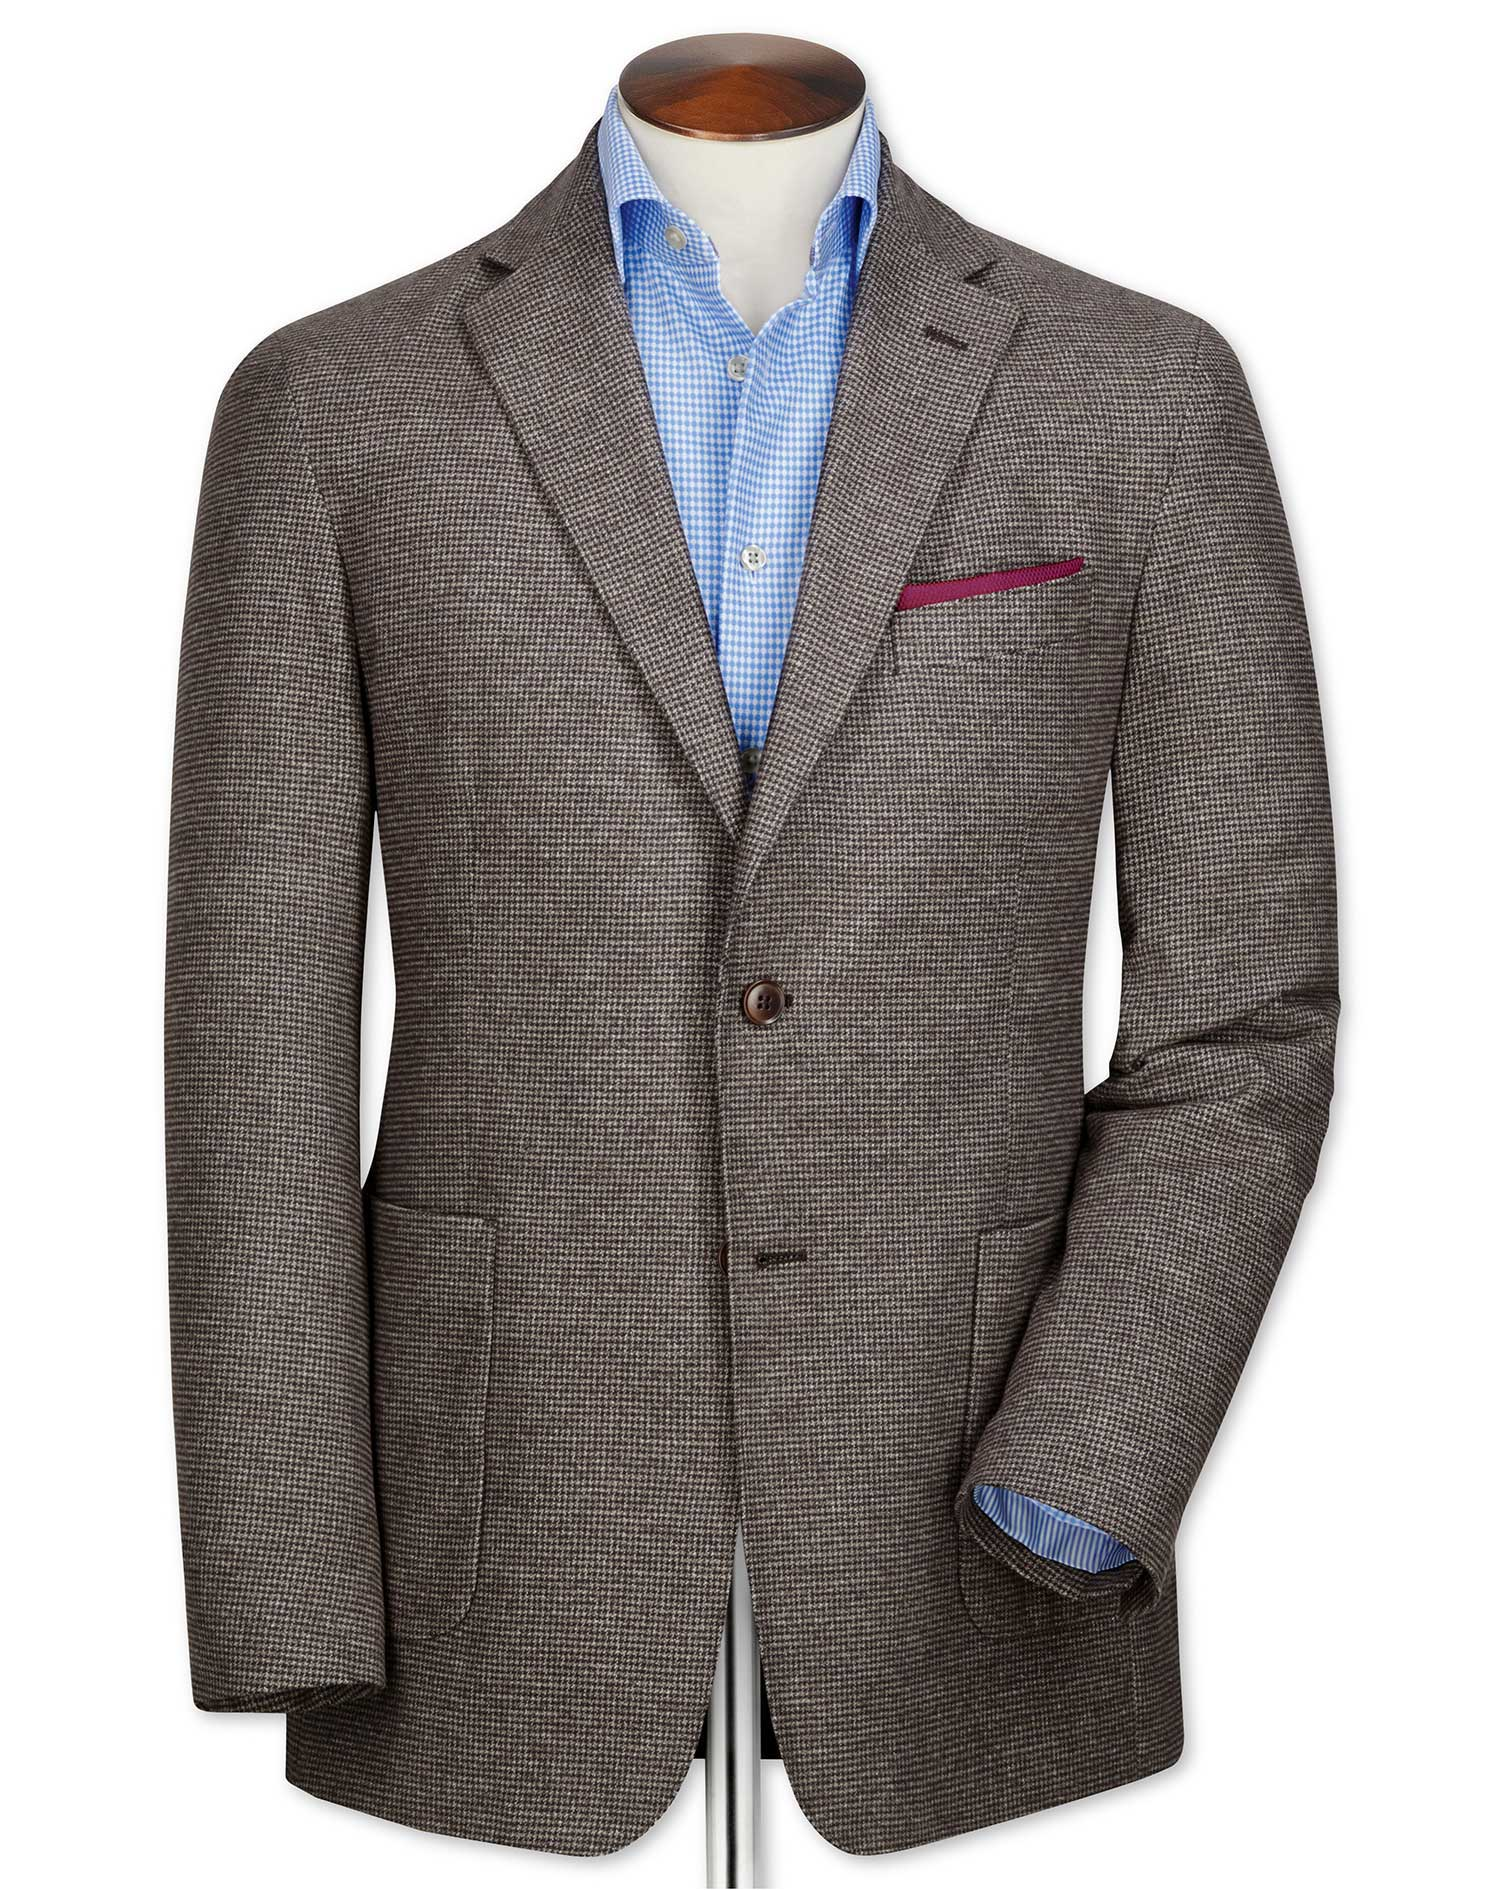 Slim Fit Brown Semi-Plain Cotton Flannel Cotton Jacket Size 44 Long by Charles Tyrwhitt